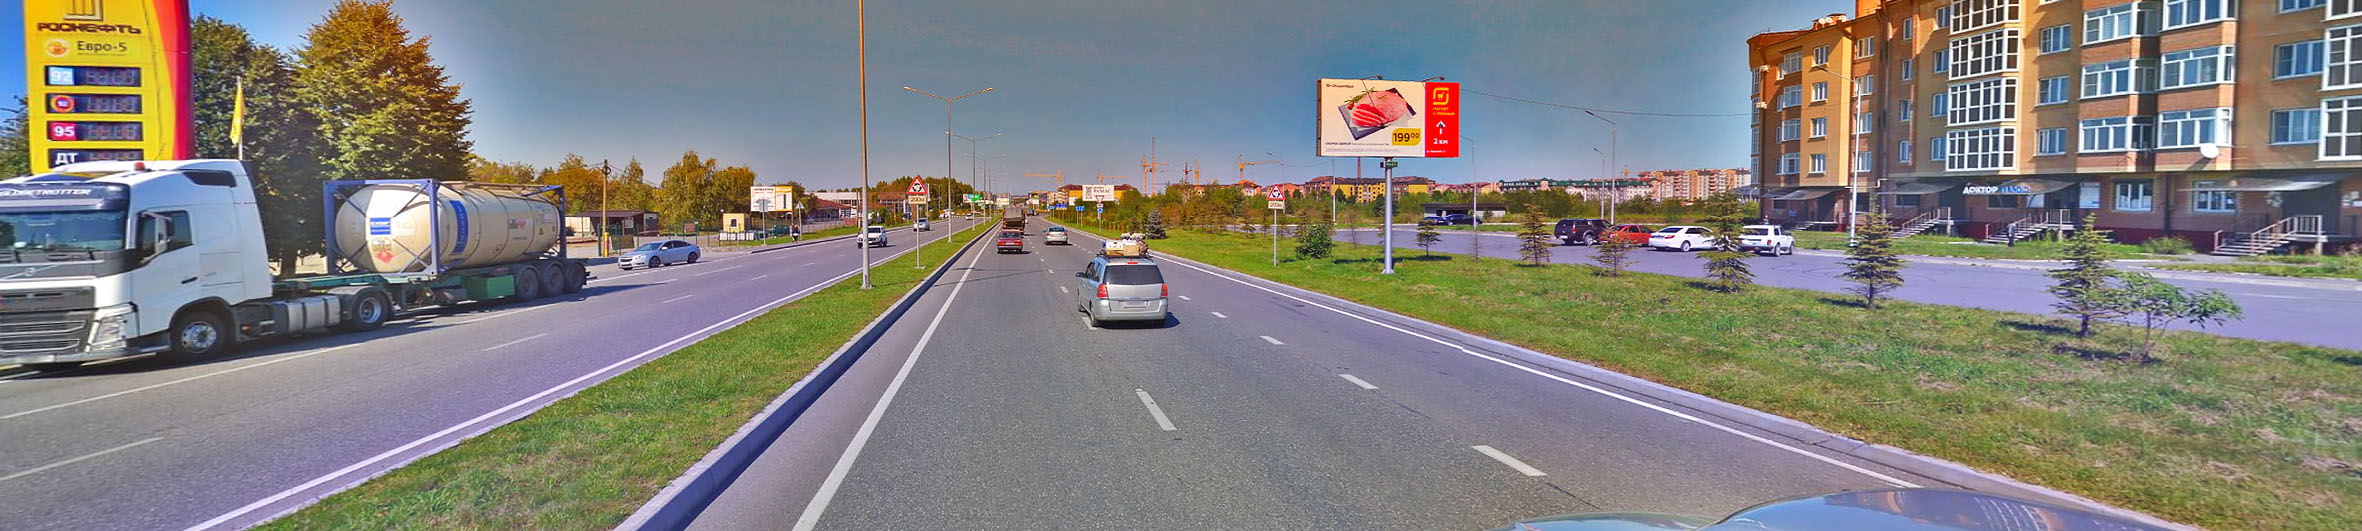 Реклама на билбордах в РСО-Алания Беслан